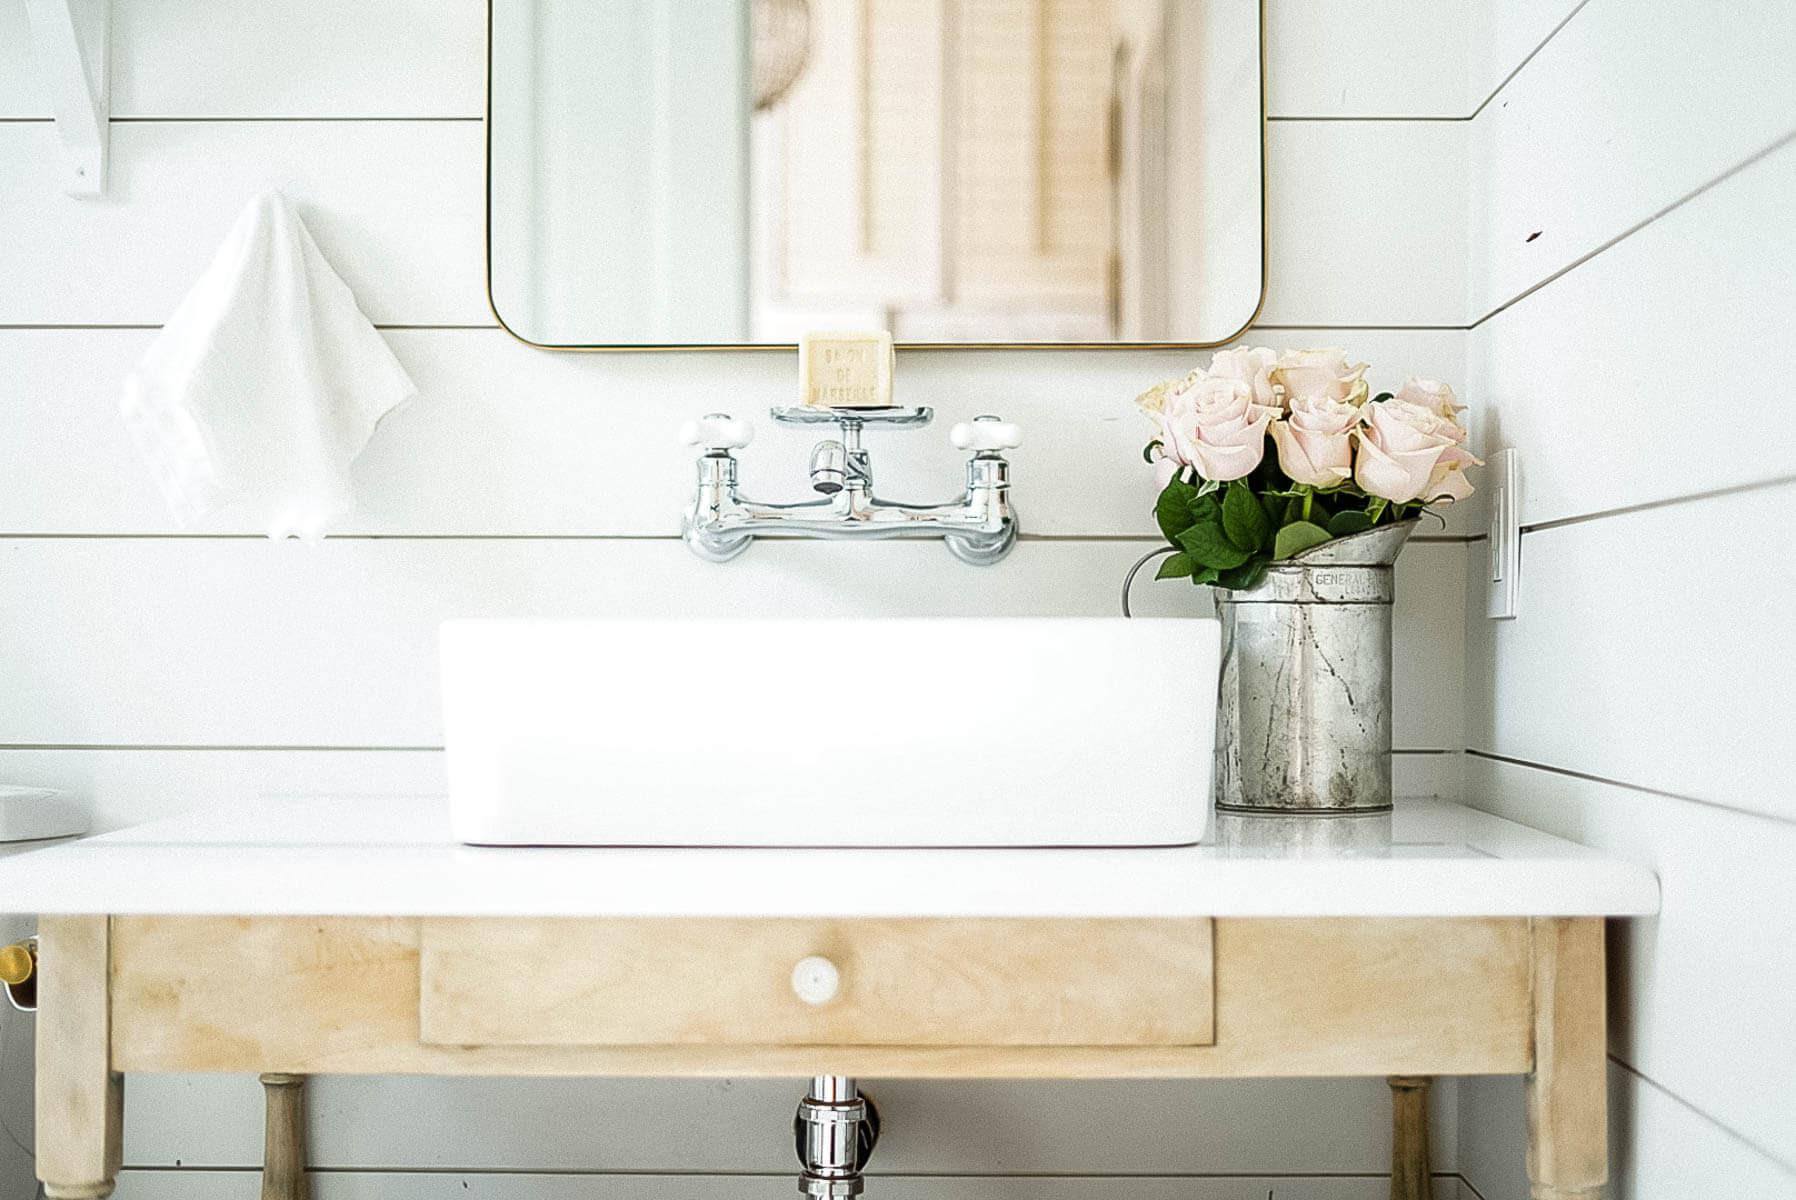 Farmhouse Bathroom Sink  Farmhouse Bathroom Renovation – 5 Proven Tips to Make a